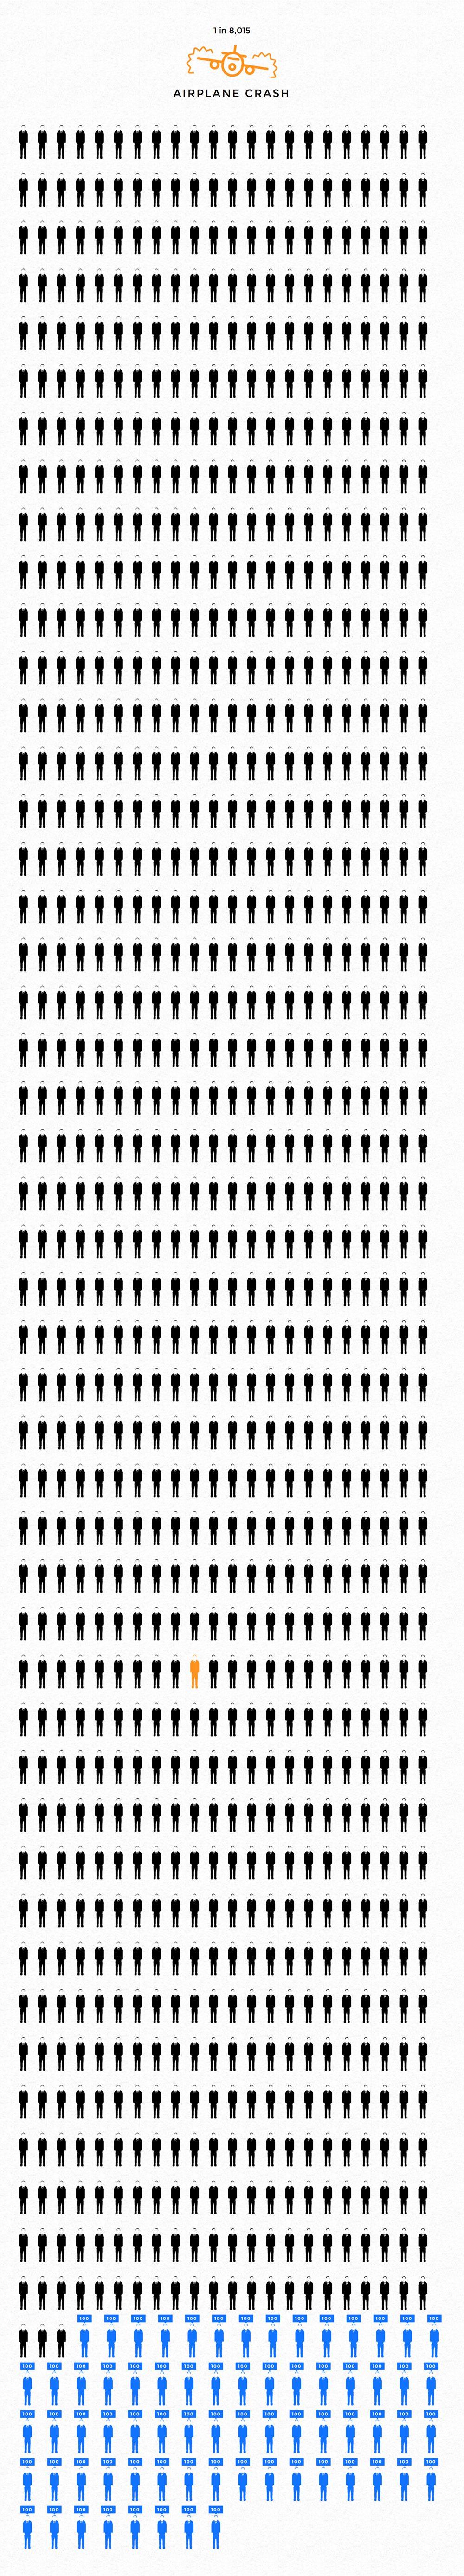 death-infographic10